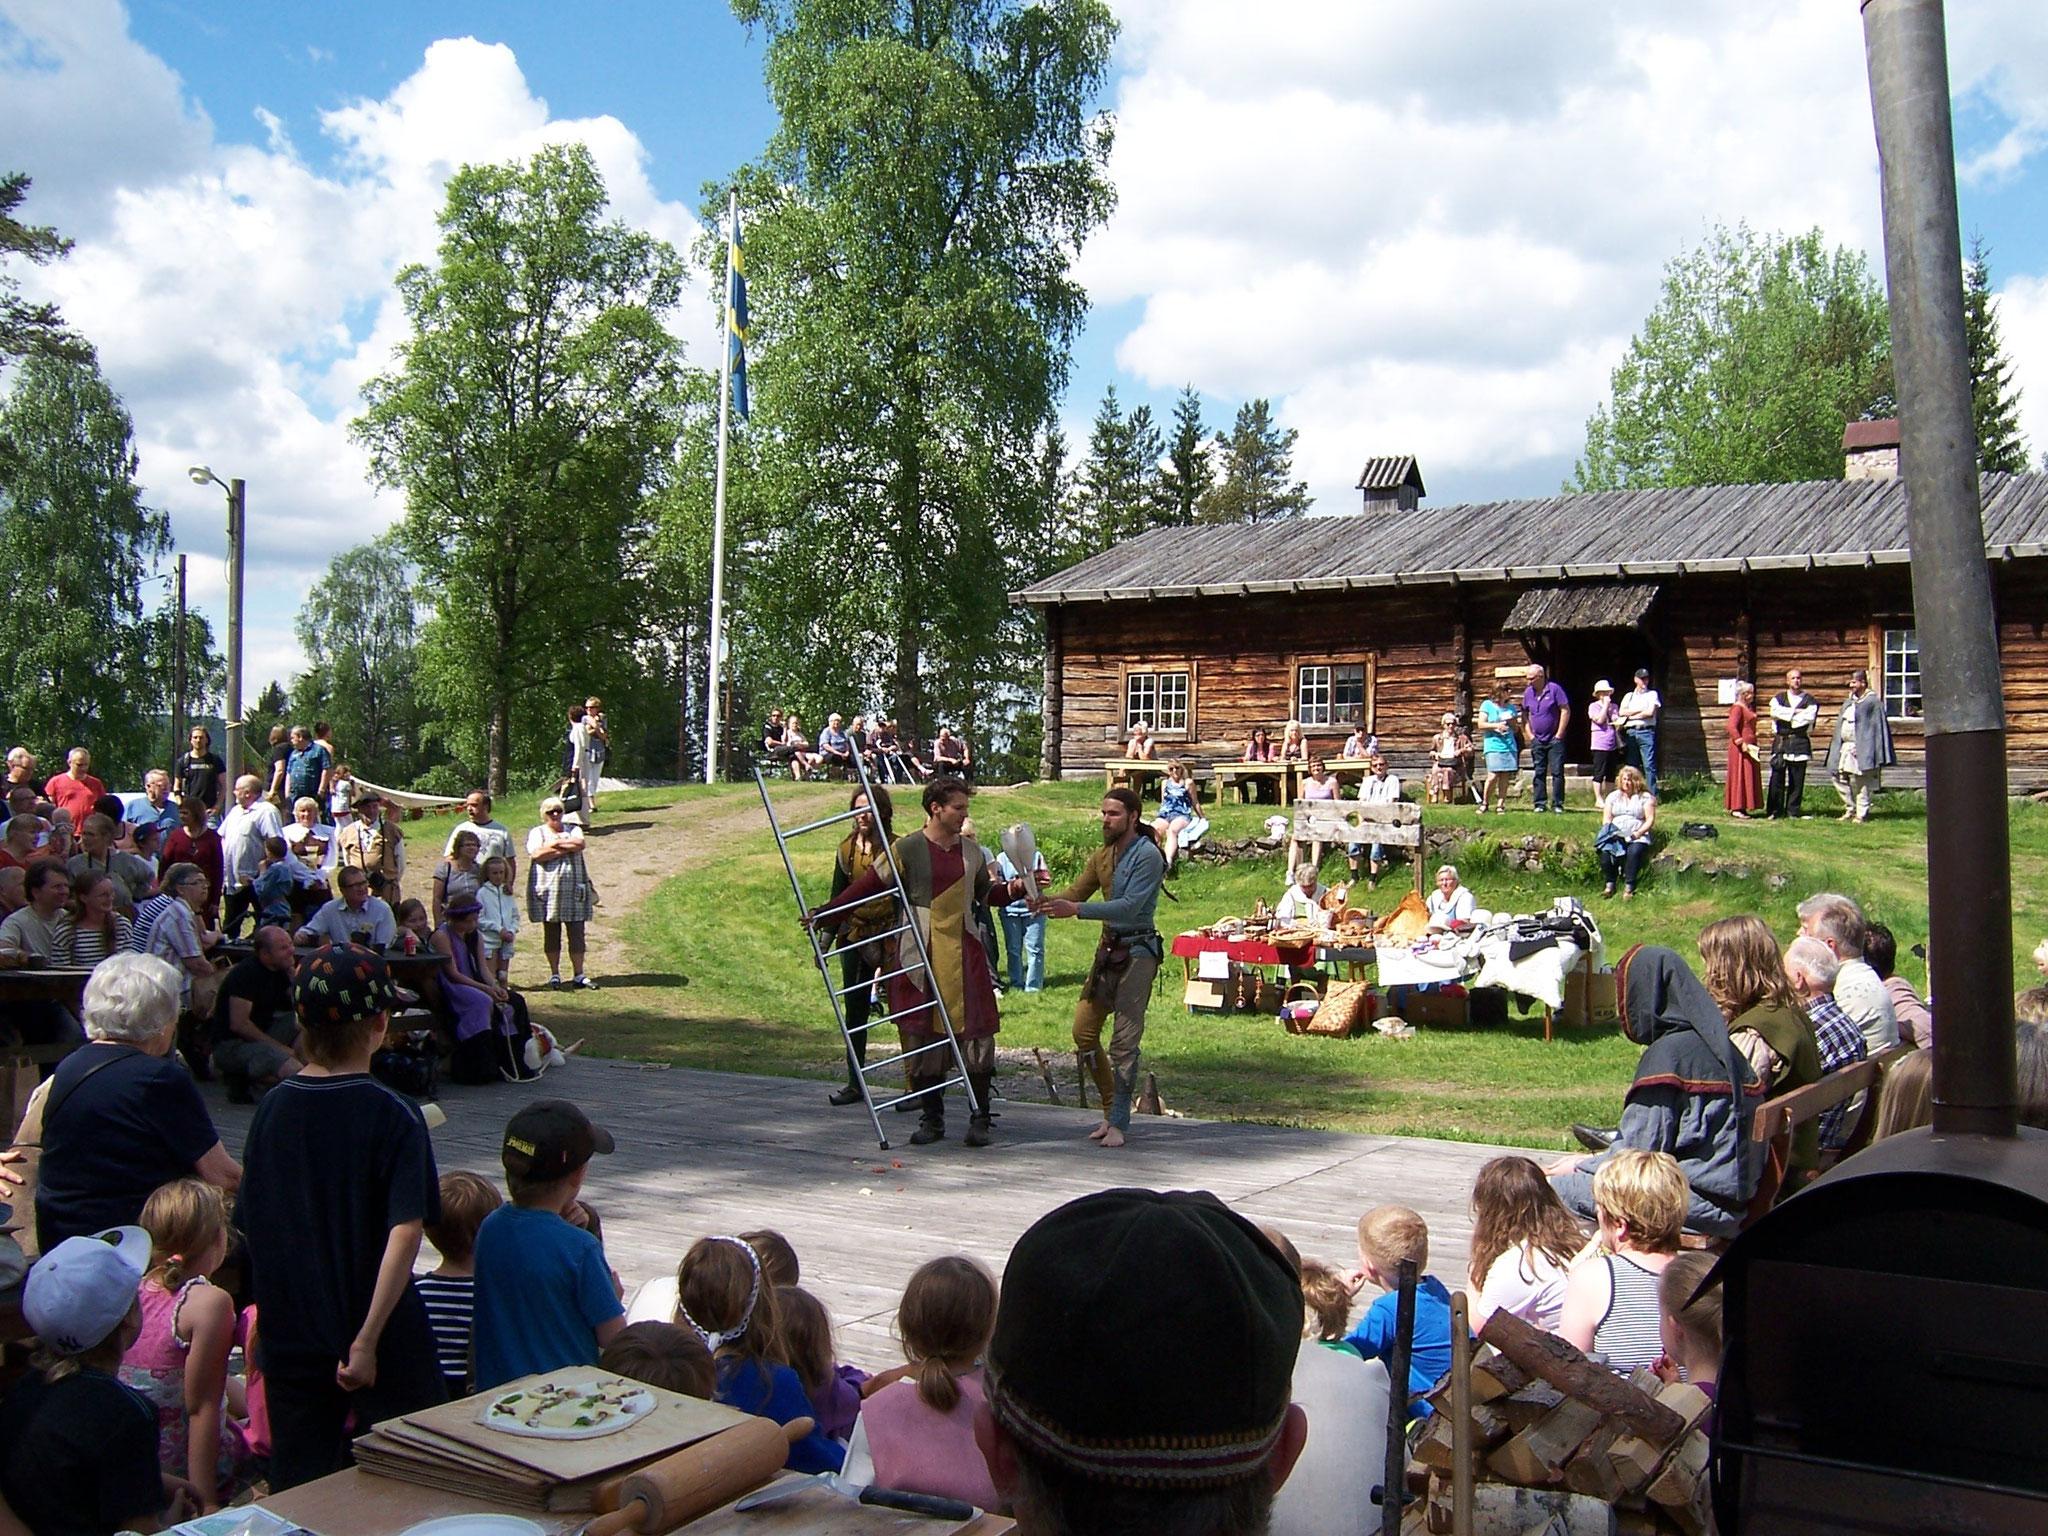 Mittelaltermarkt in Lekvattnet